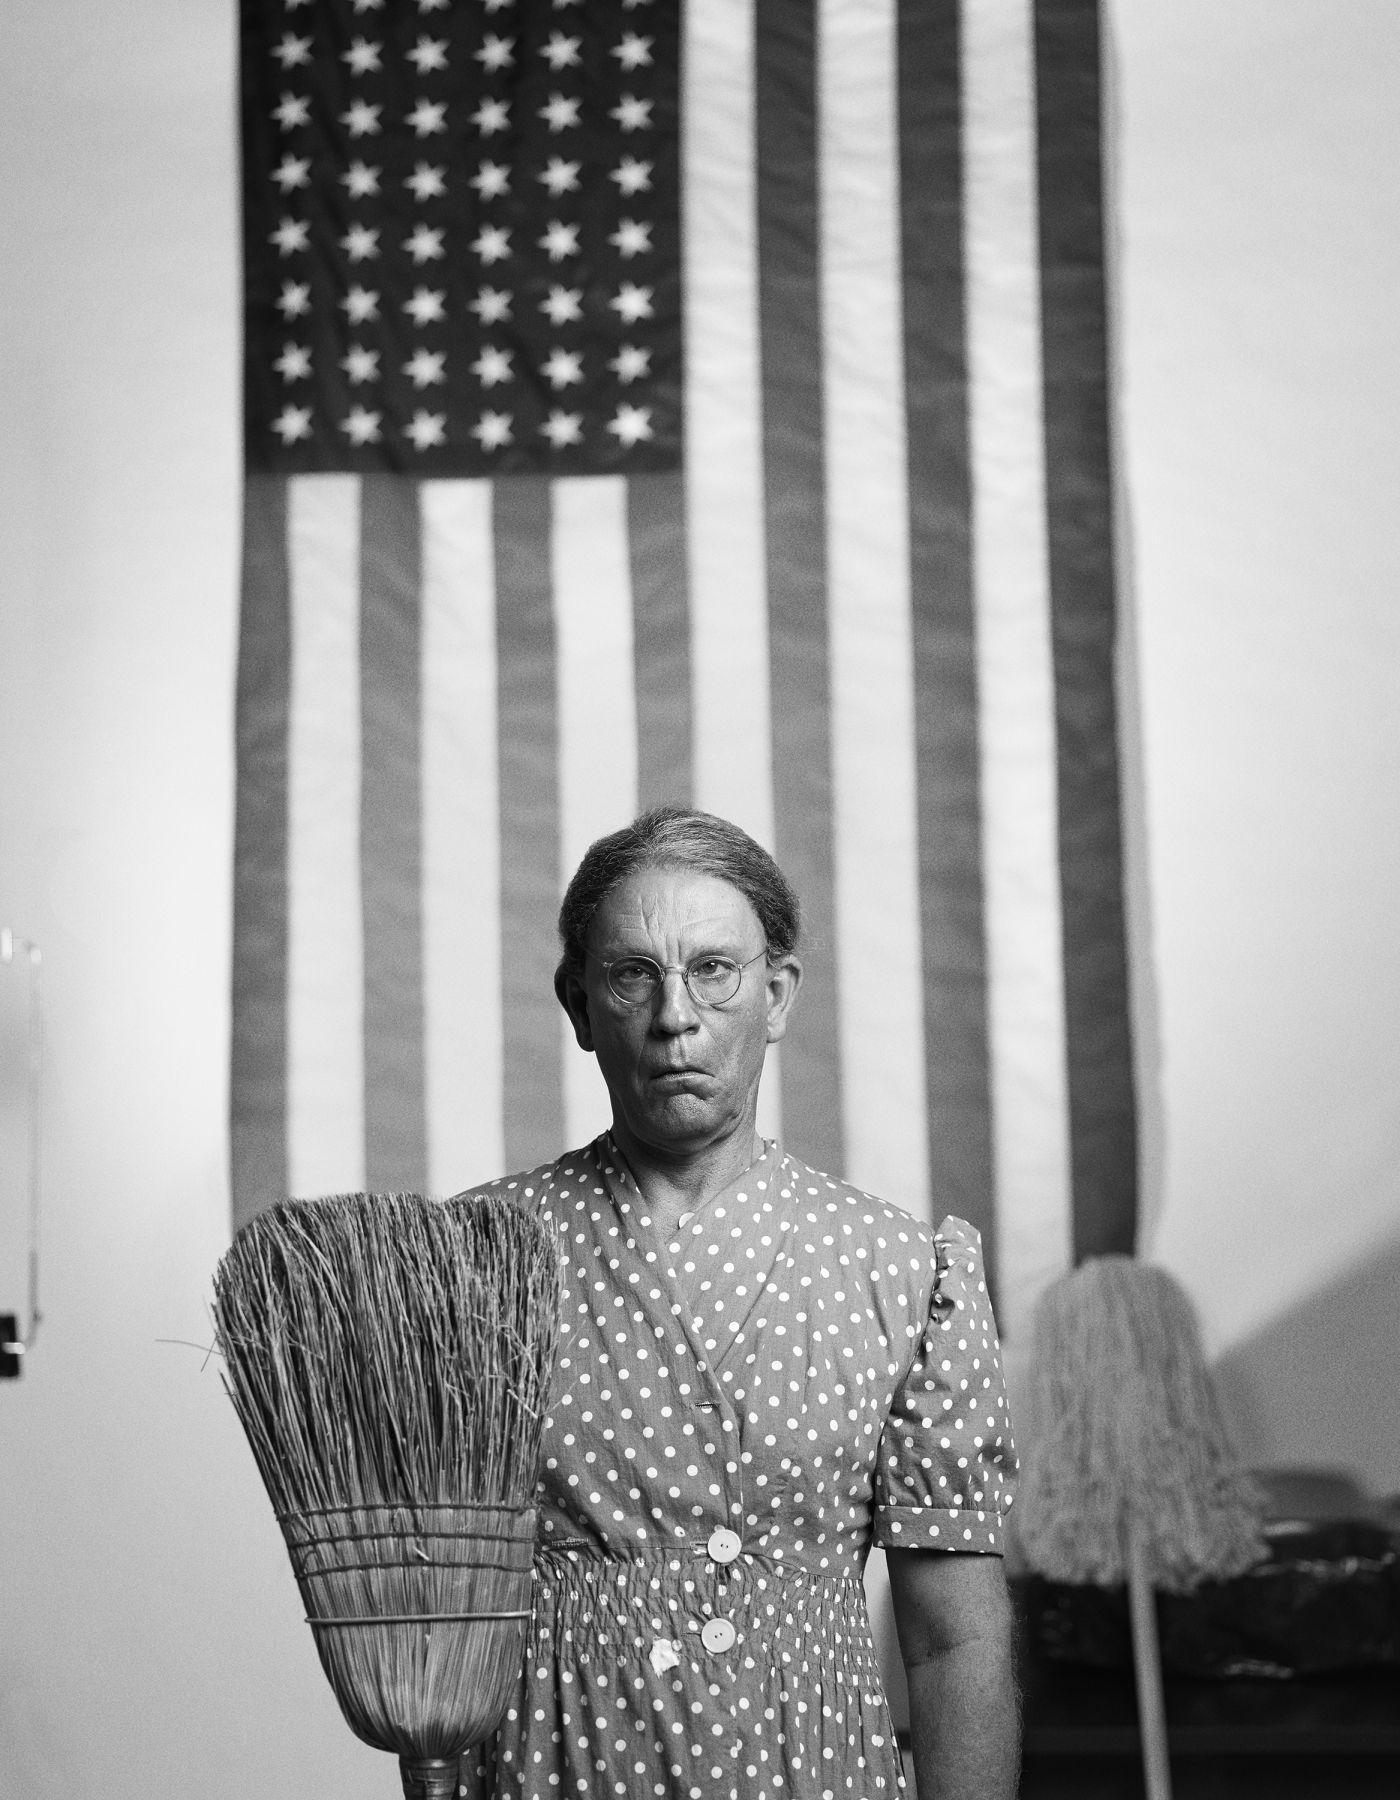 Gordon Parks / American Gothic, Washington, D.C. (1942), 2014